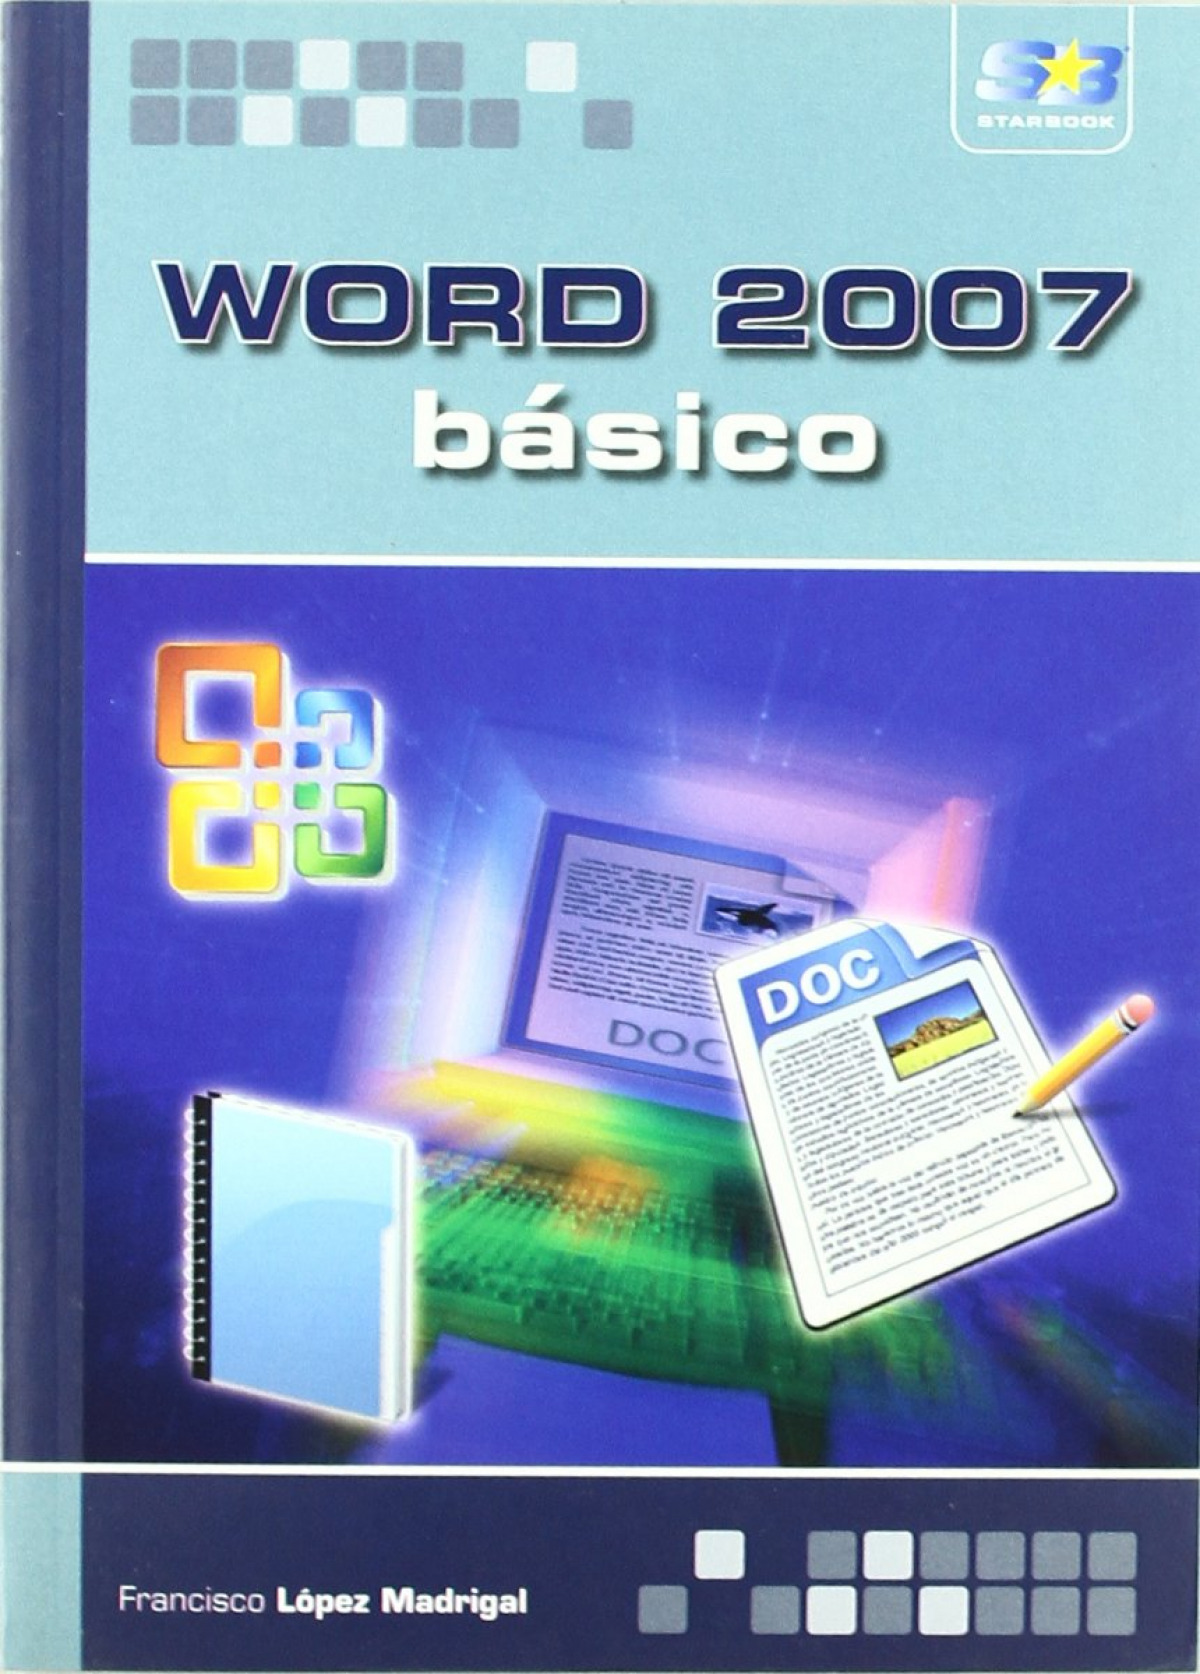 Word 2007: Basico 9788493689629